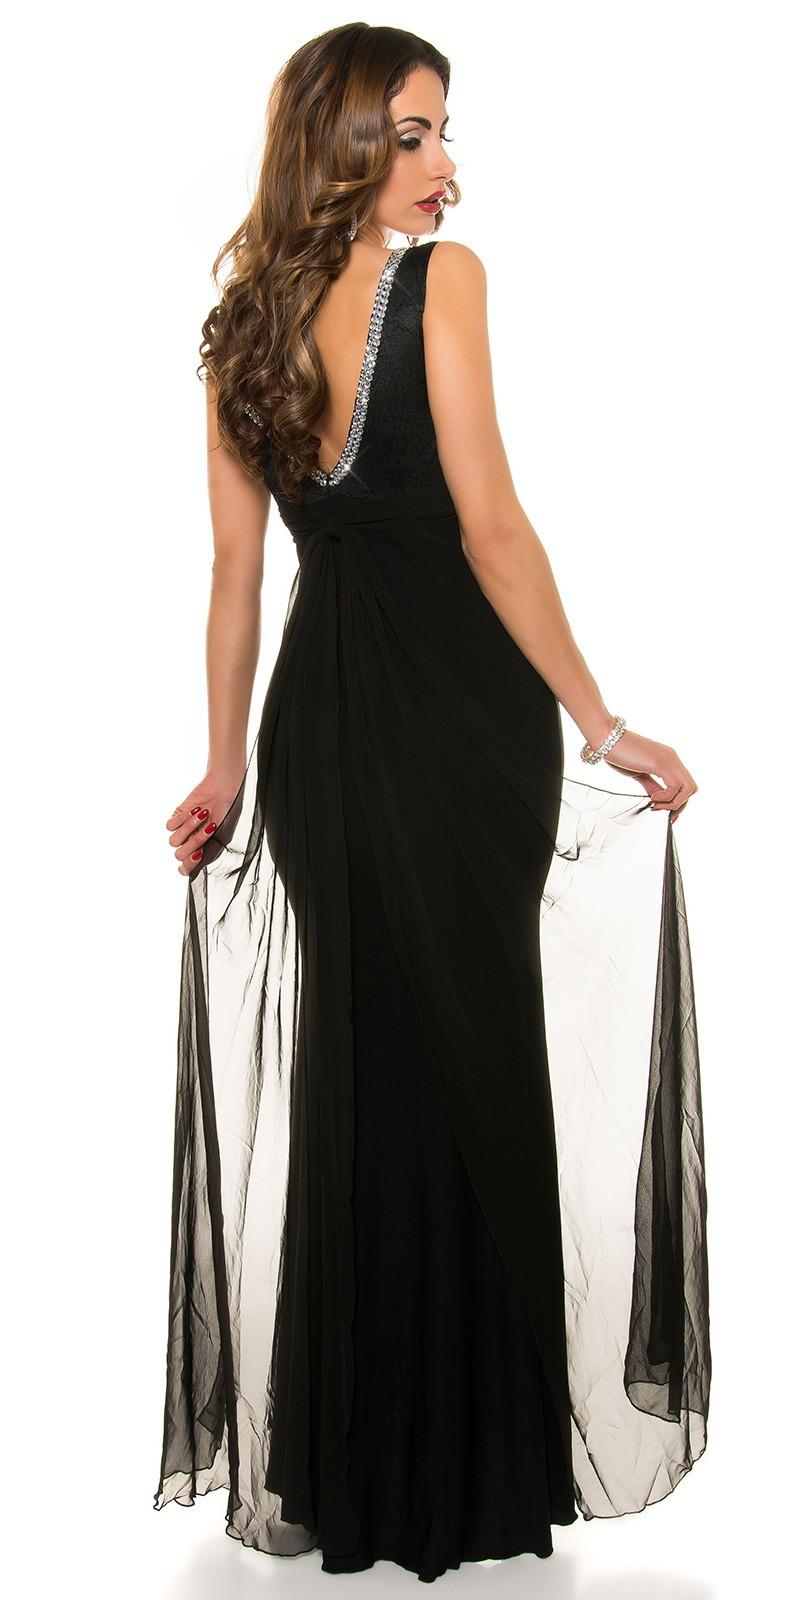 Obrázok pre Spoločenské šaty s čipkou a mašľou   čierne ... 5572def3f9f